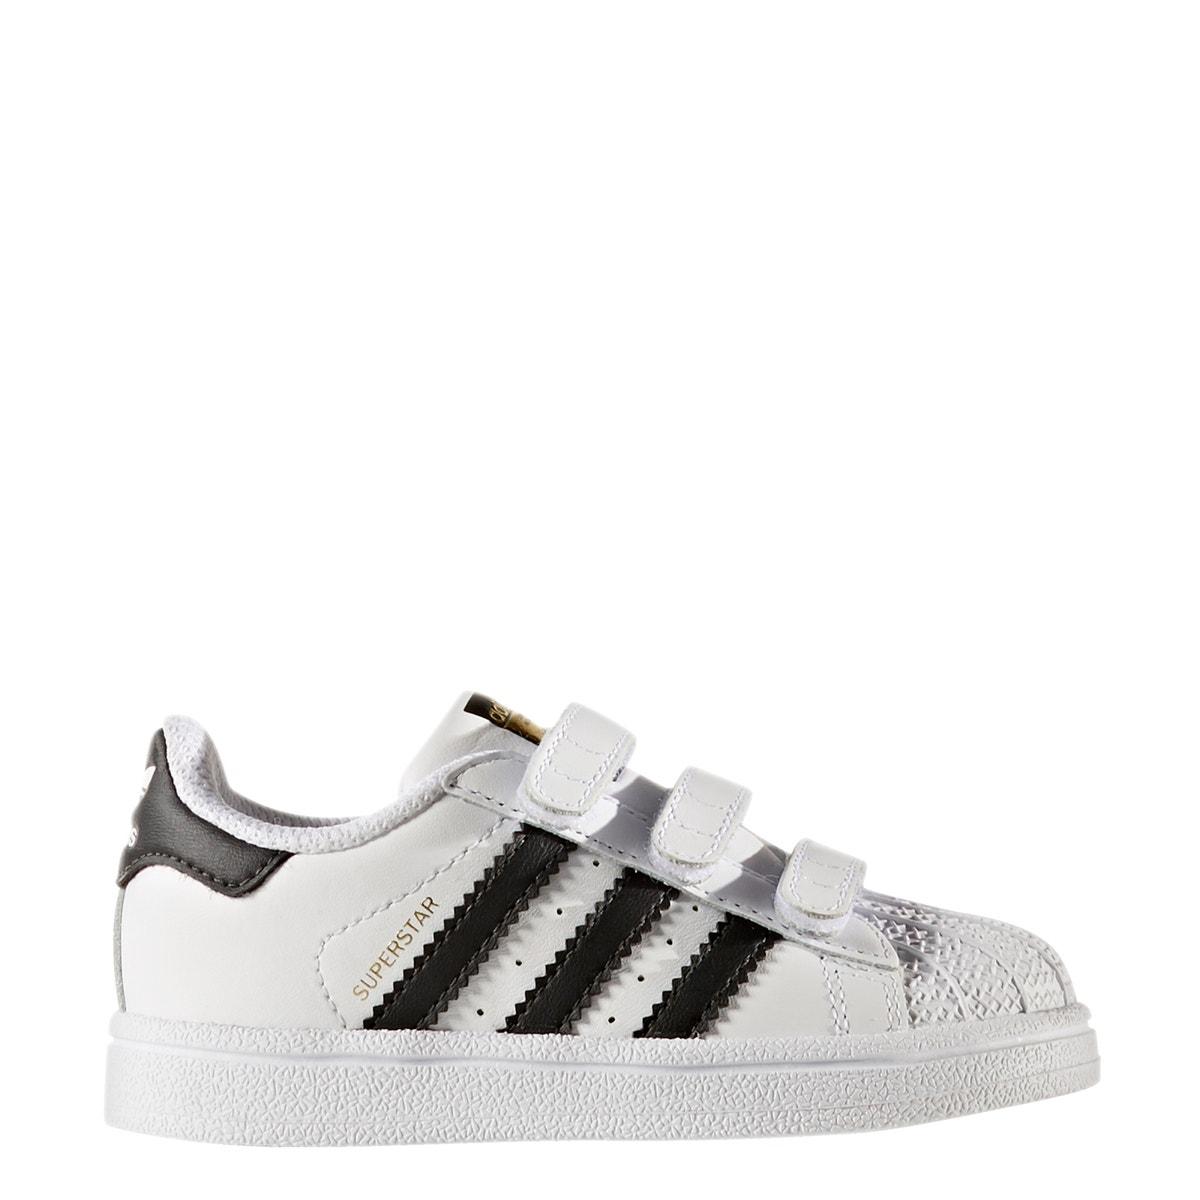 adidas Originals - Adidas Originals CF I 350080529 - 1123